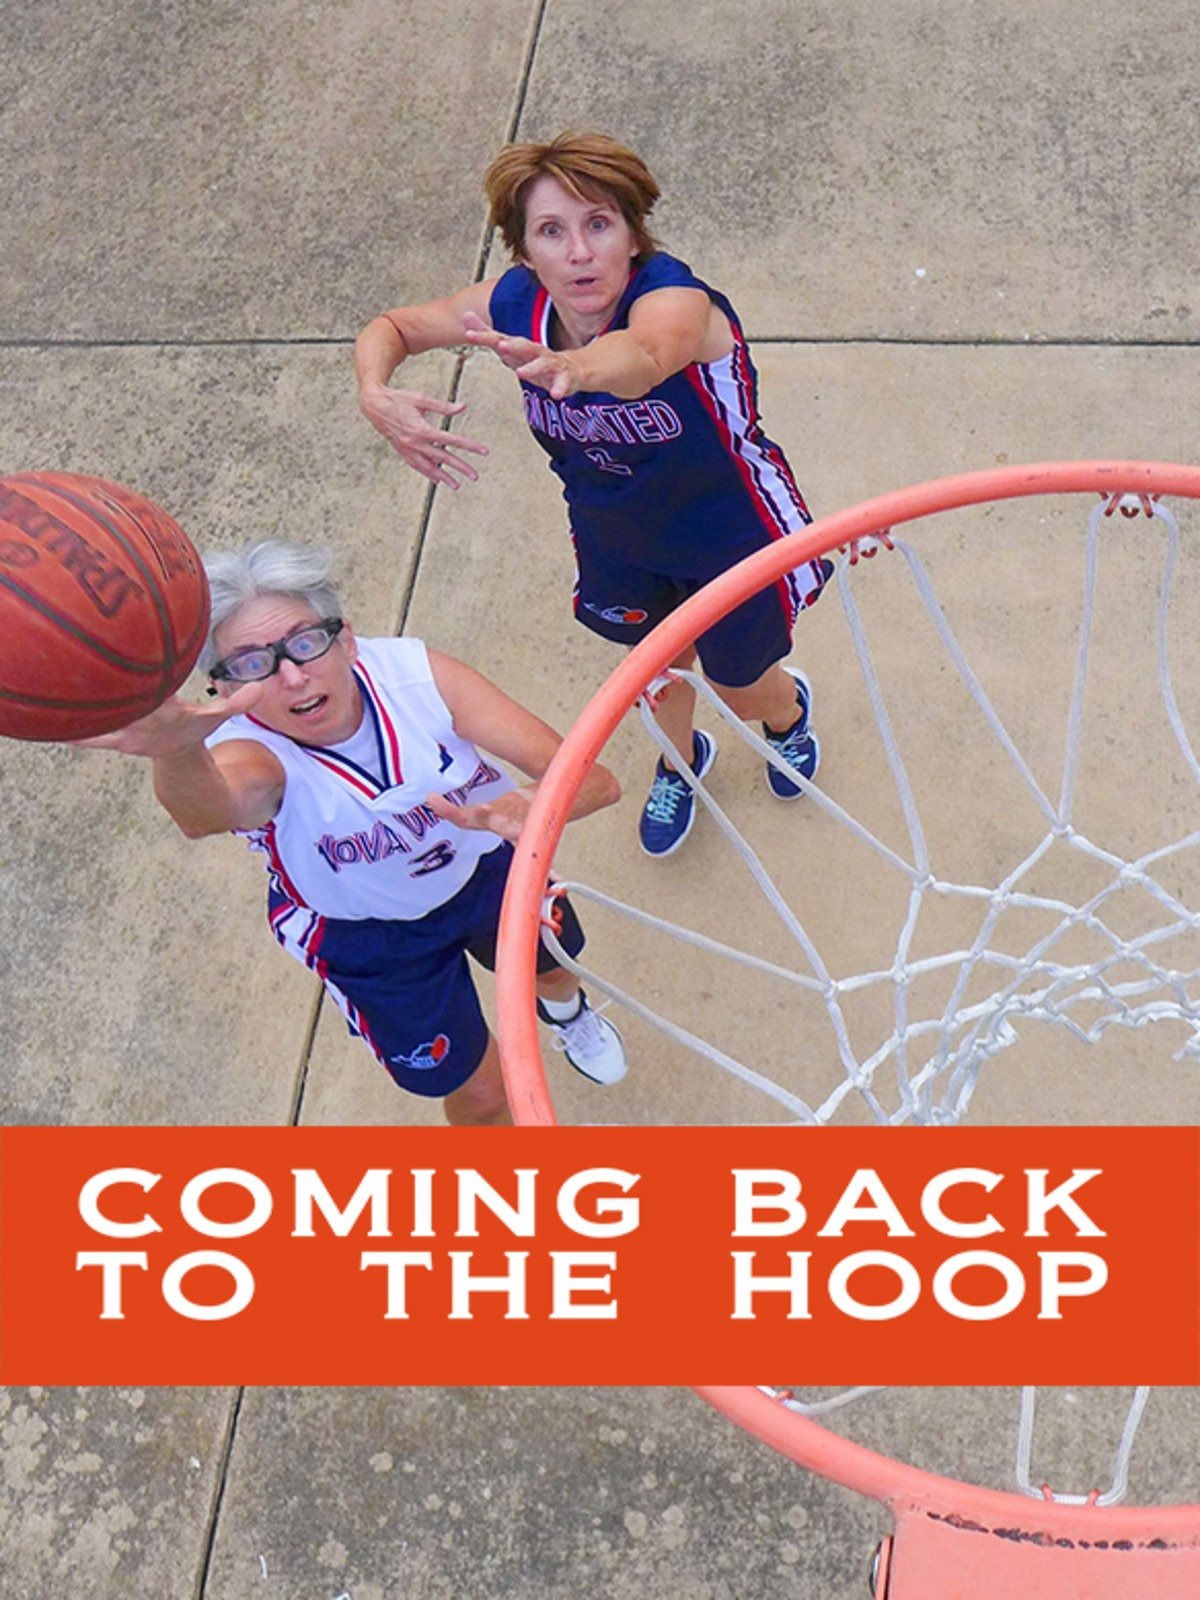 Amazon.com: Coming Back to the Hoop: Jane Pitman, Jane Pittman